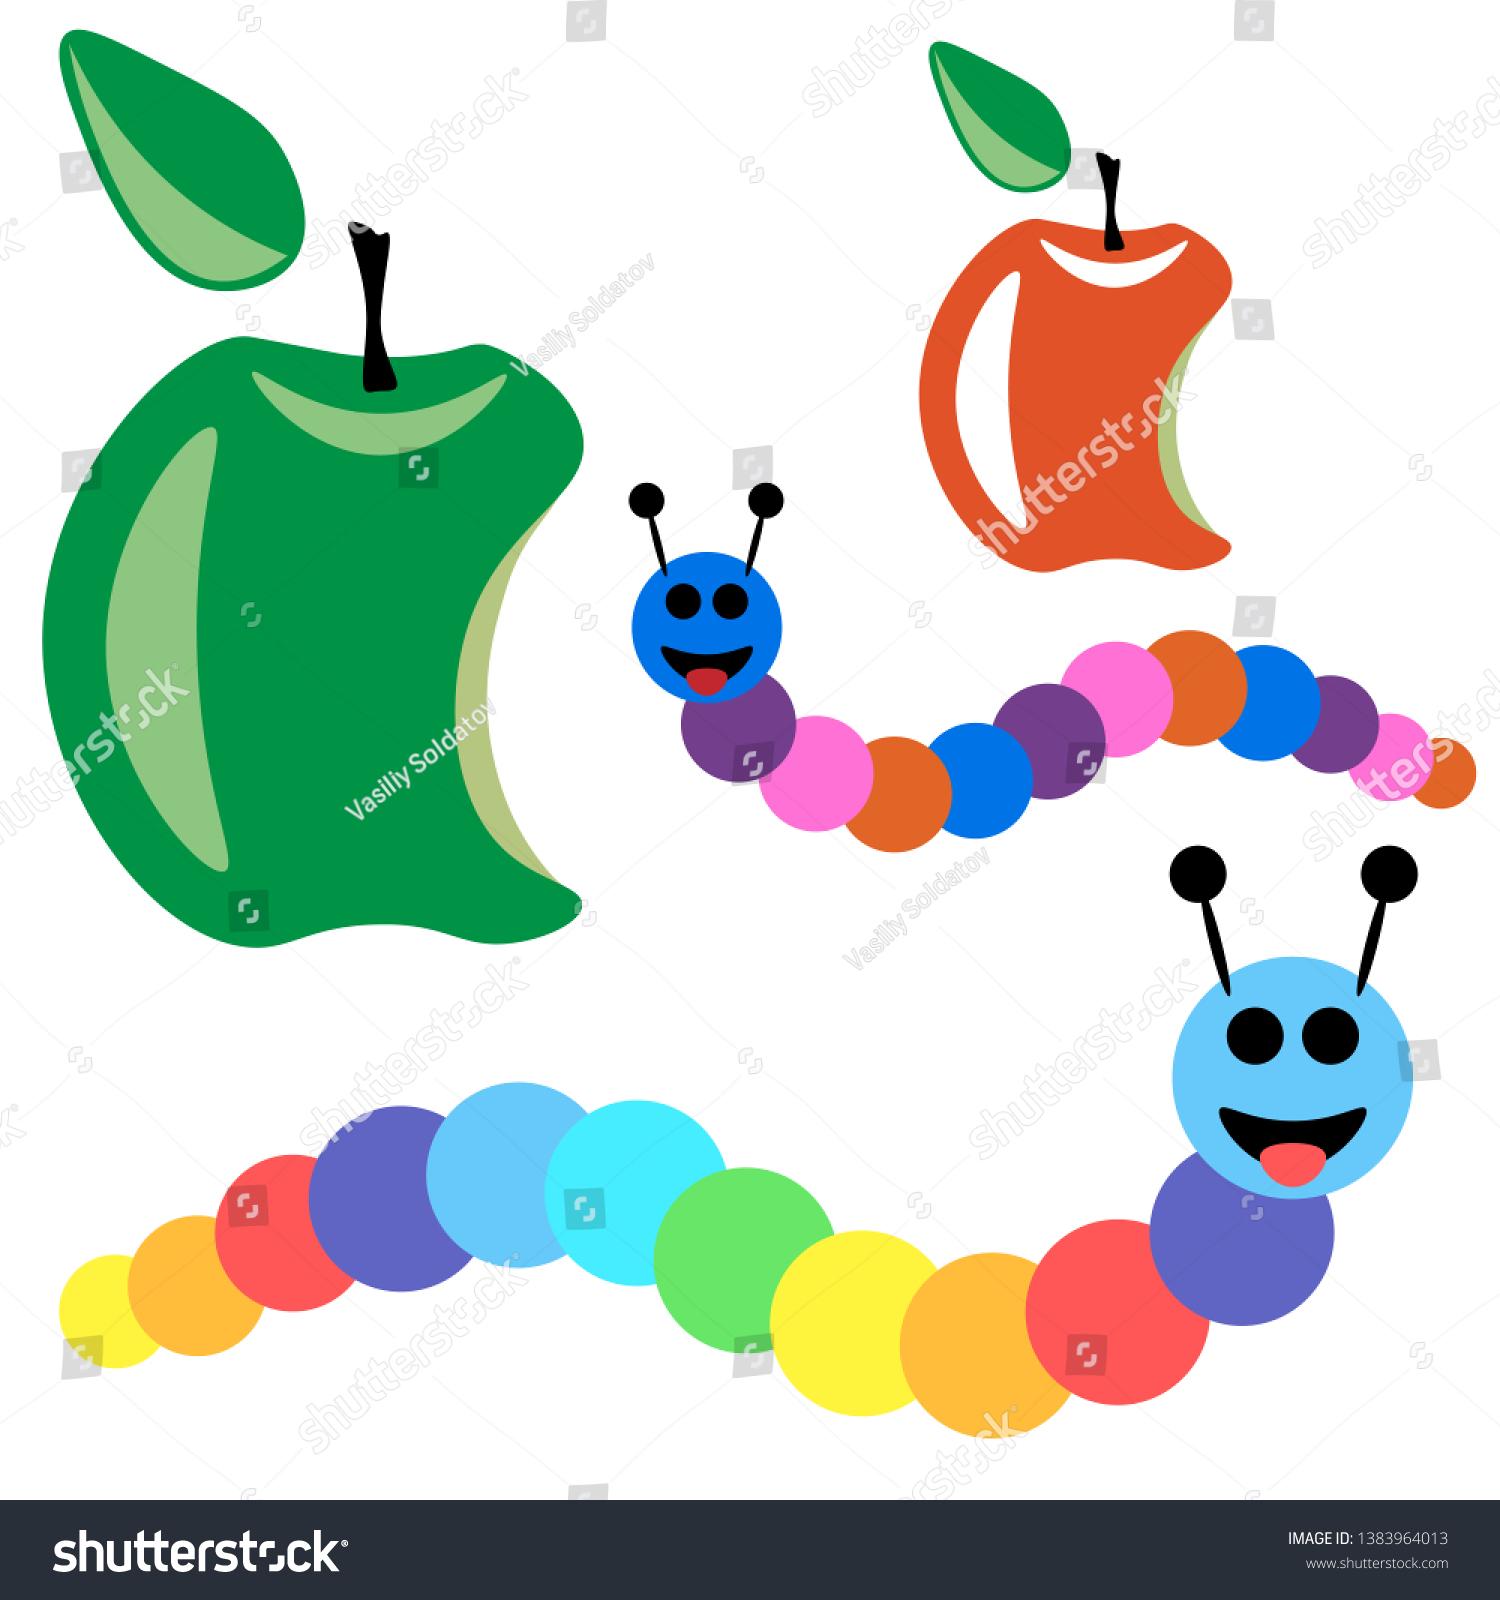 Colored Cartoon Caterpillar Bitten Apple Smiling Stock Vector